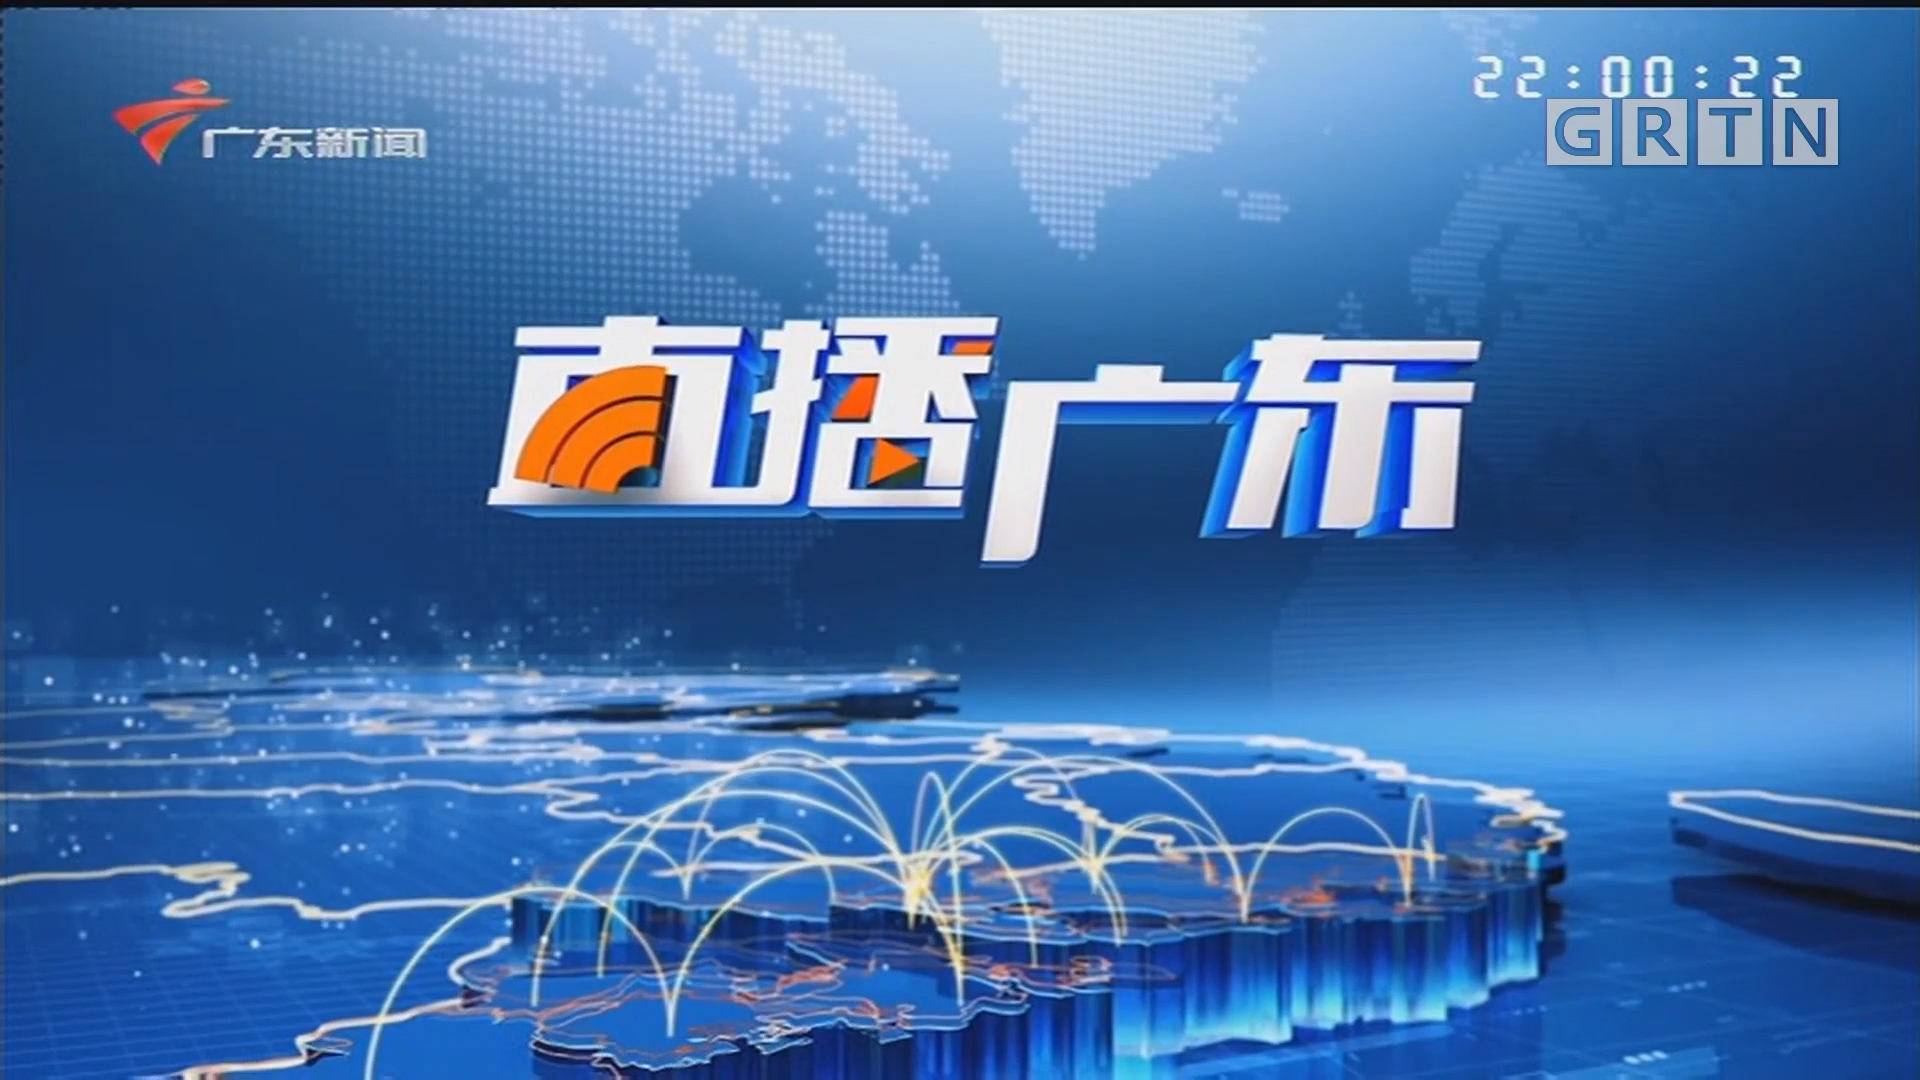 [HD][2020-05-14]直播广东:重磅!央行等出台30条金融政策支持粤港澳大湾区